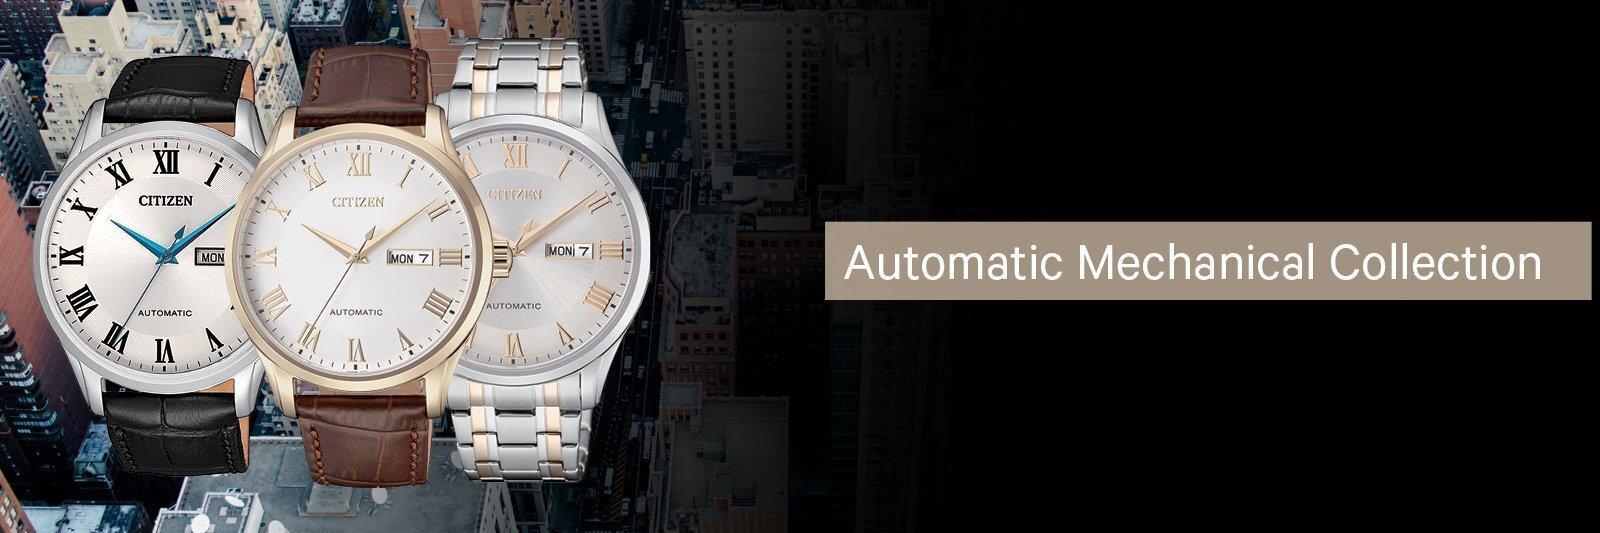 bst đồng hồ máy cơ automatic citizen đẹp mới nhất